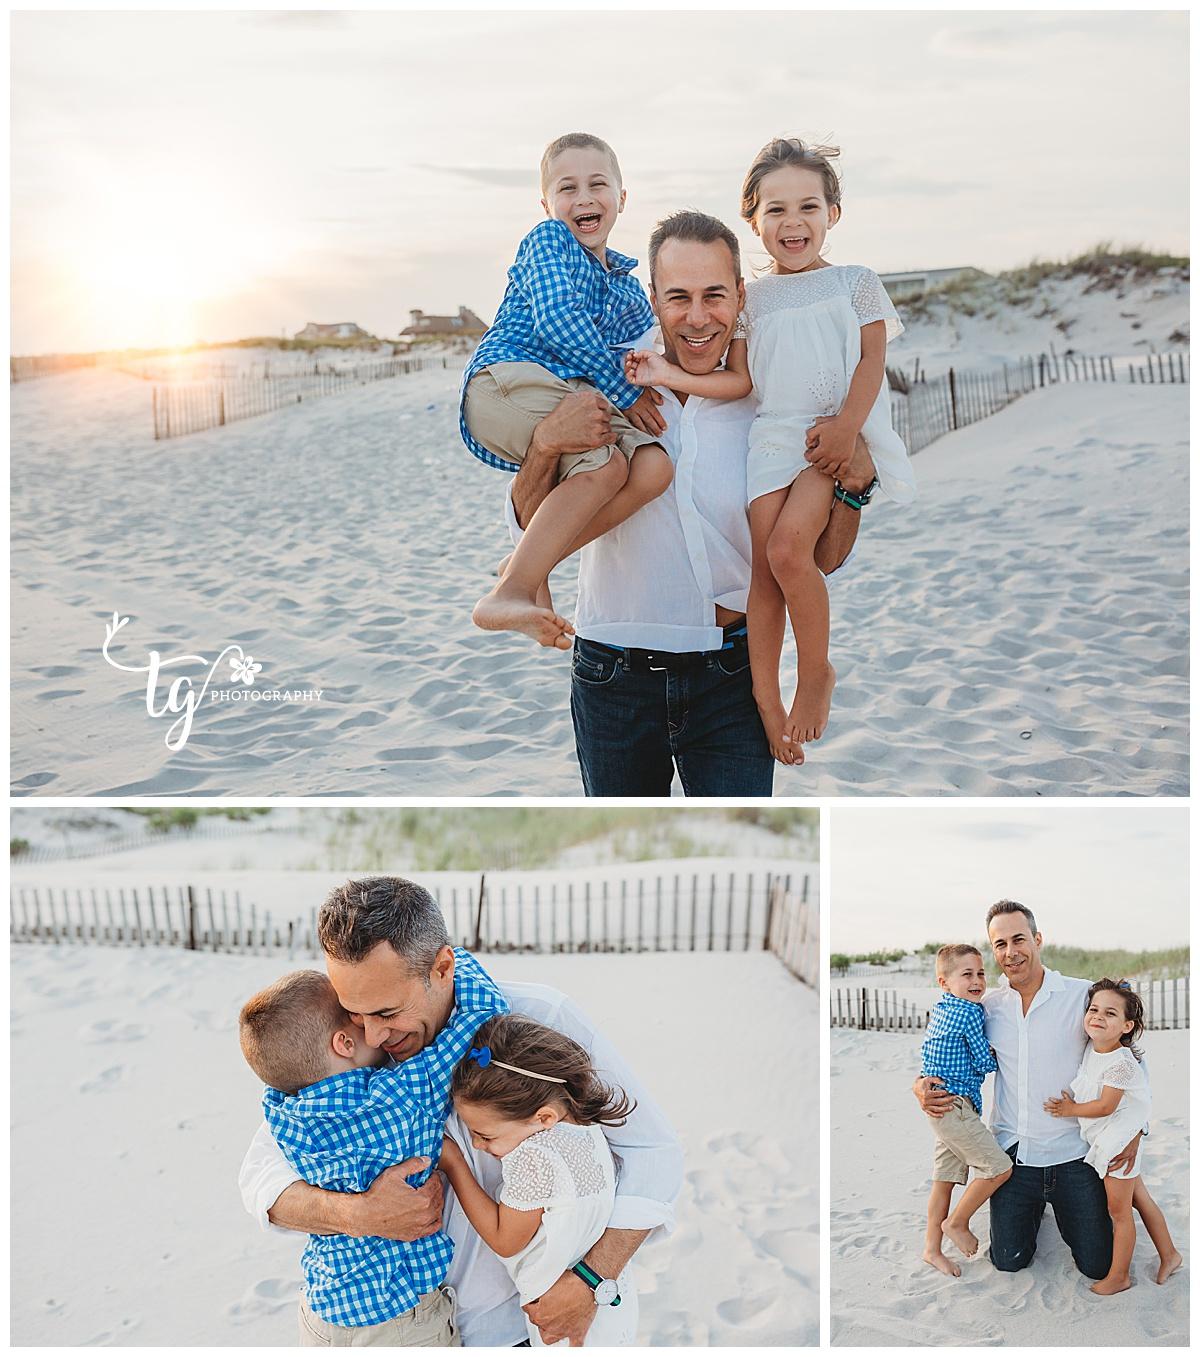 Long Island photographer for photos of family